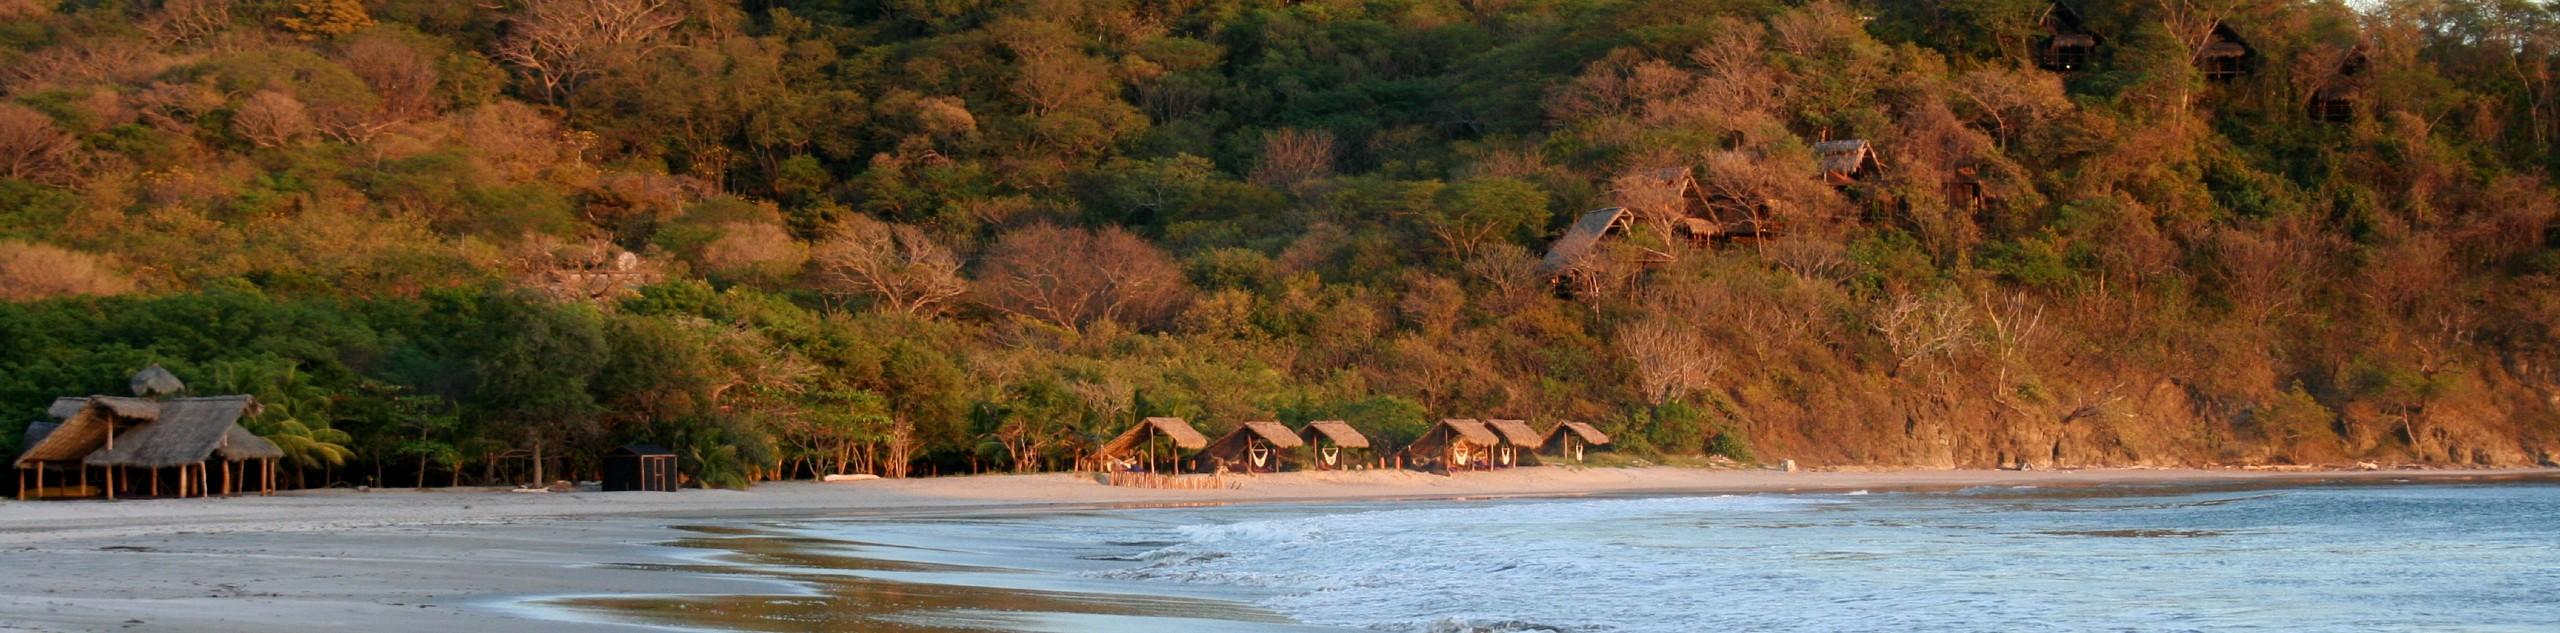 South Pacific Nicaragua